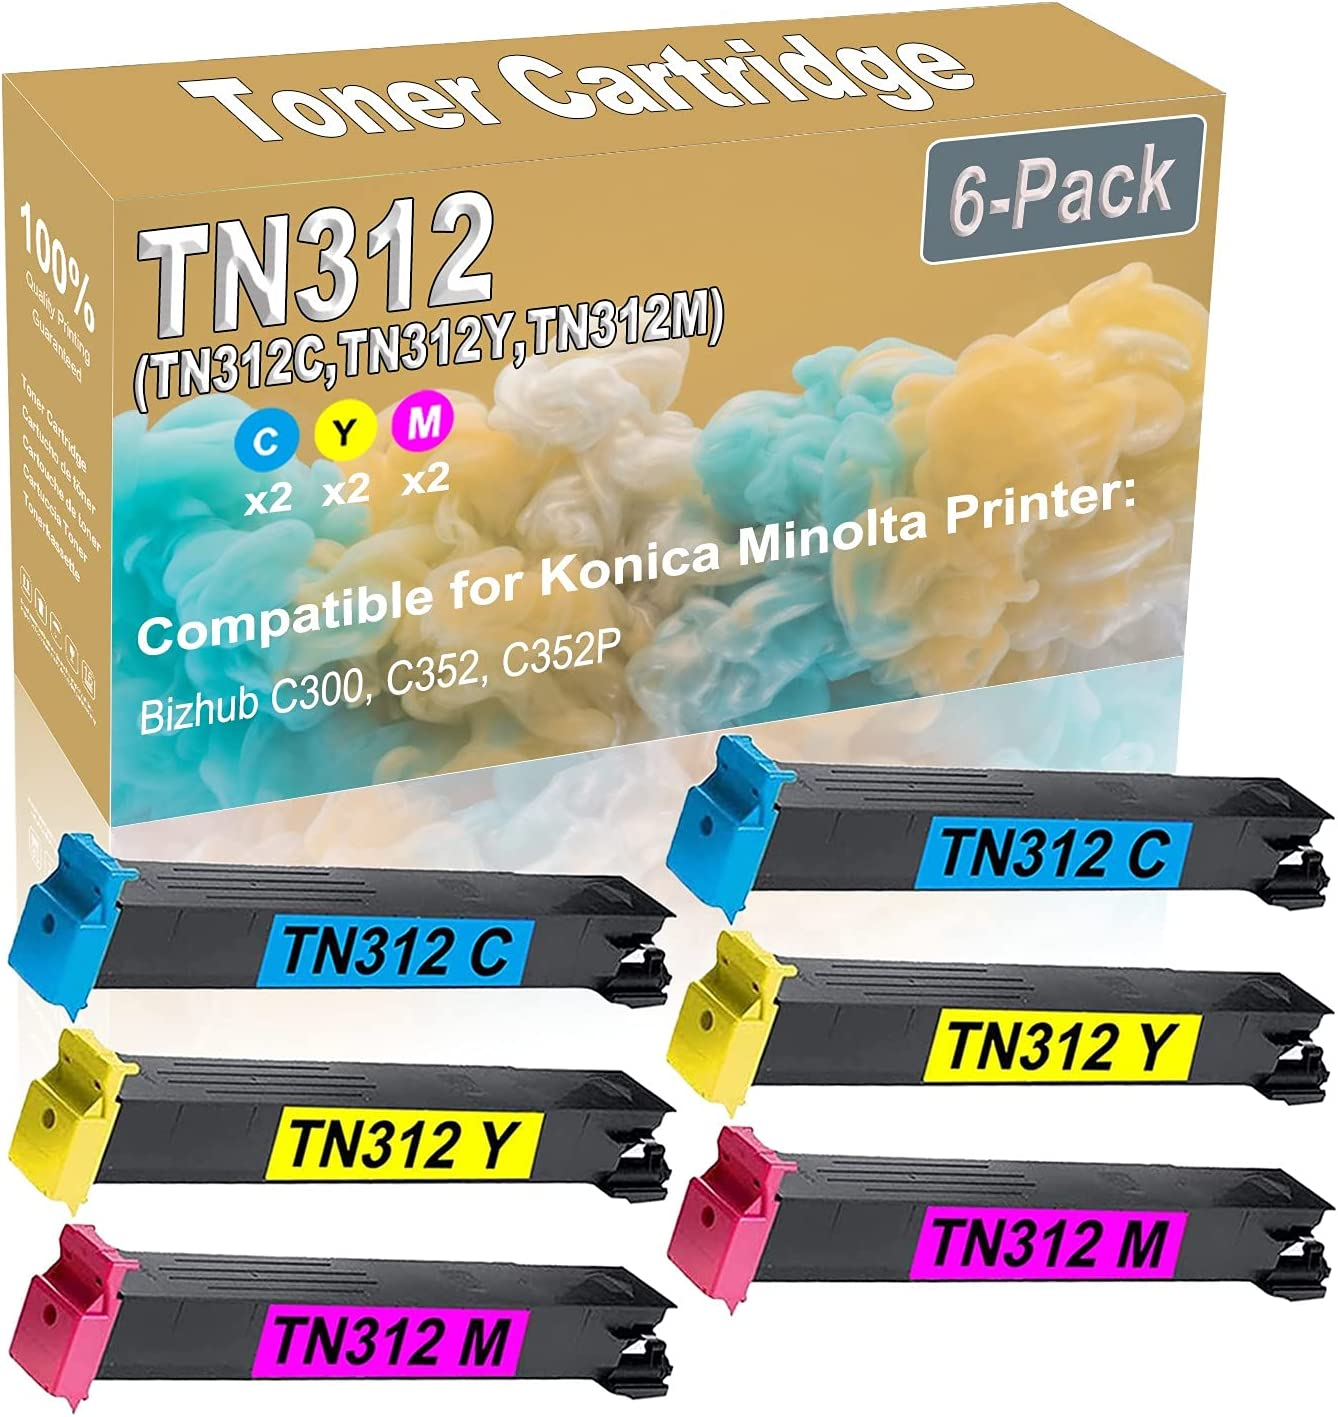 6-Pack (2C+2Y+2M) Compatible Bizhub C300 C352 C352P Laser Toner Cartridge (High Capacity) Replacement for Konica Minolta TN312 (TN312C TN312Y TN312M) Printer Toner Cartridge